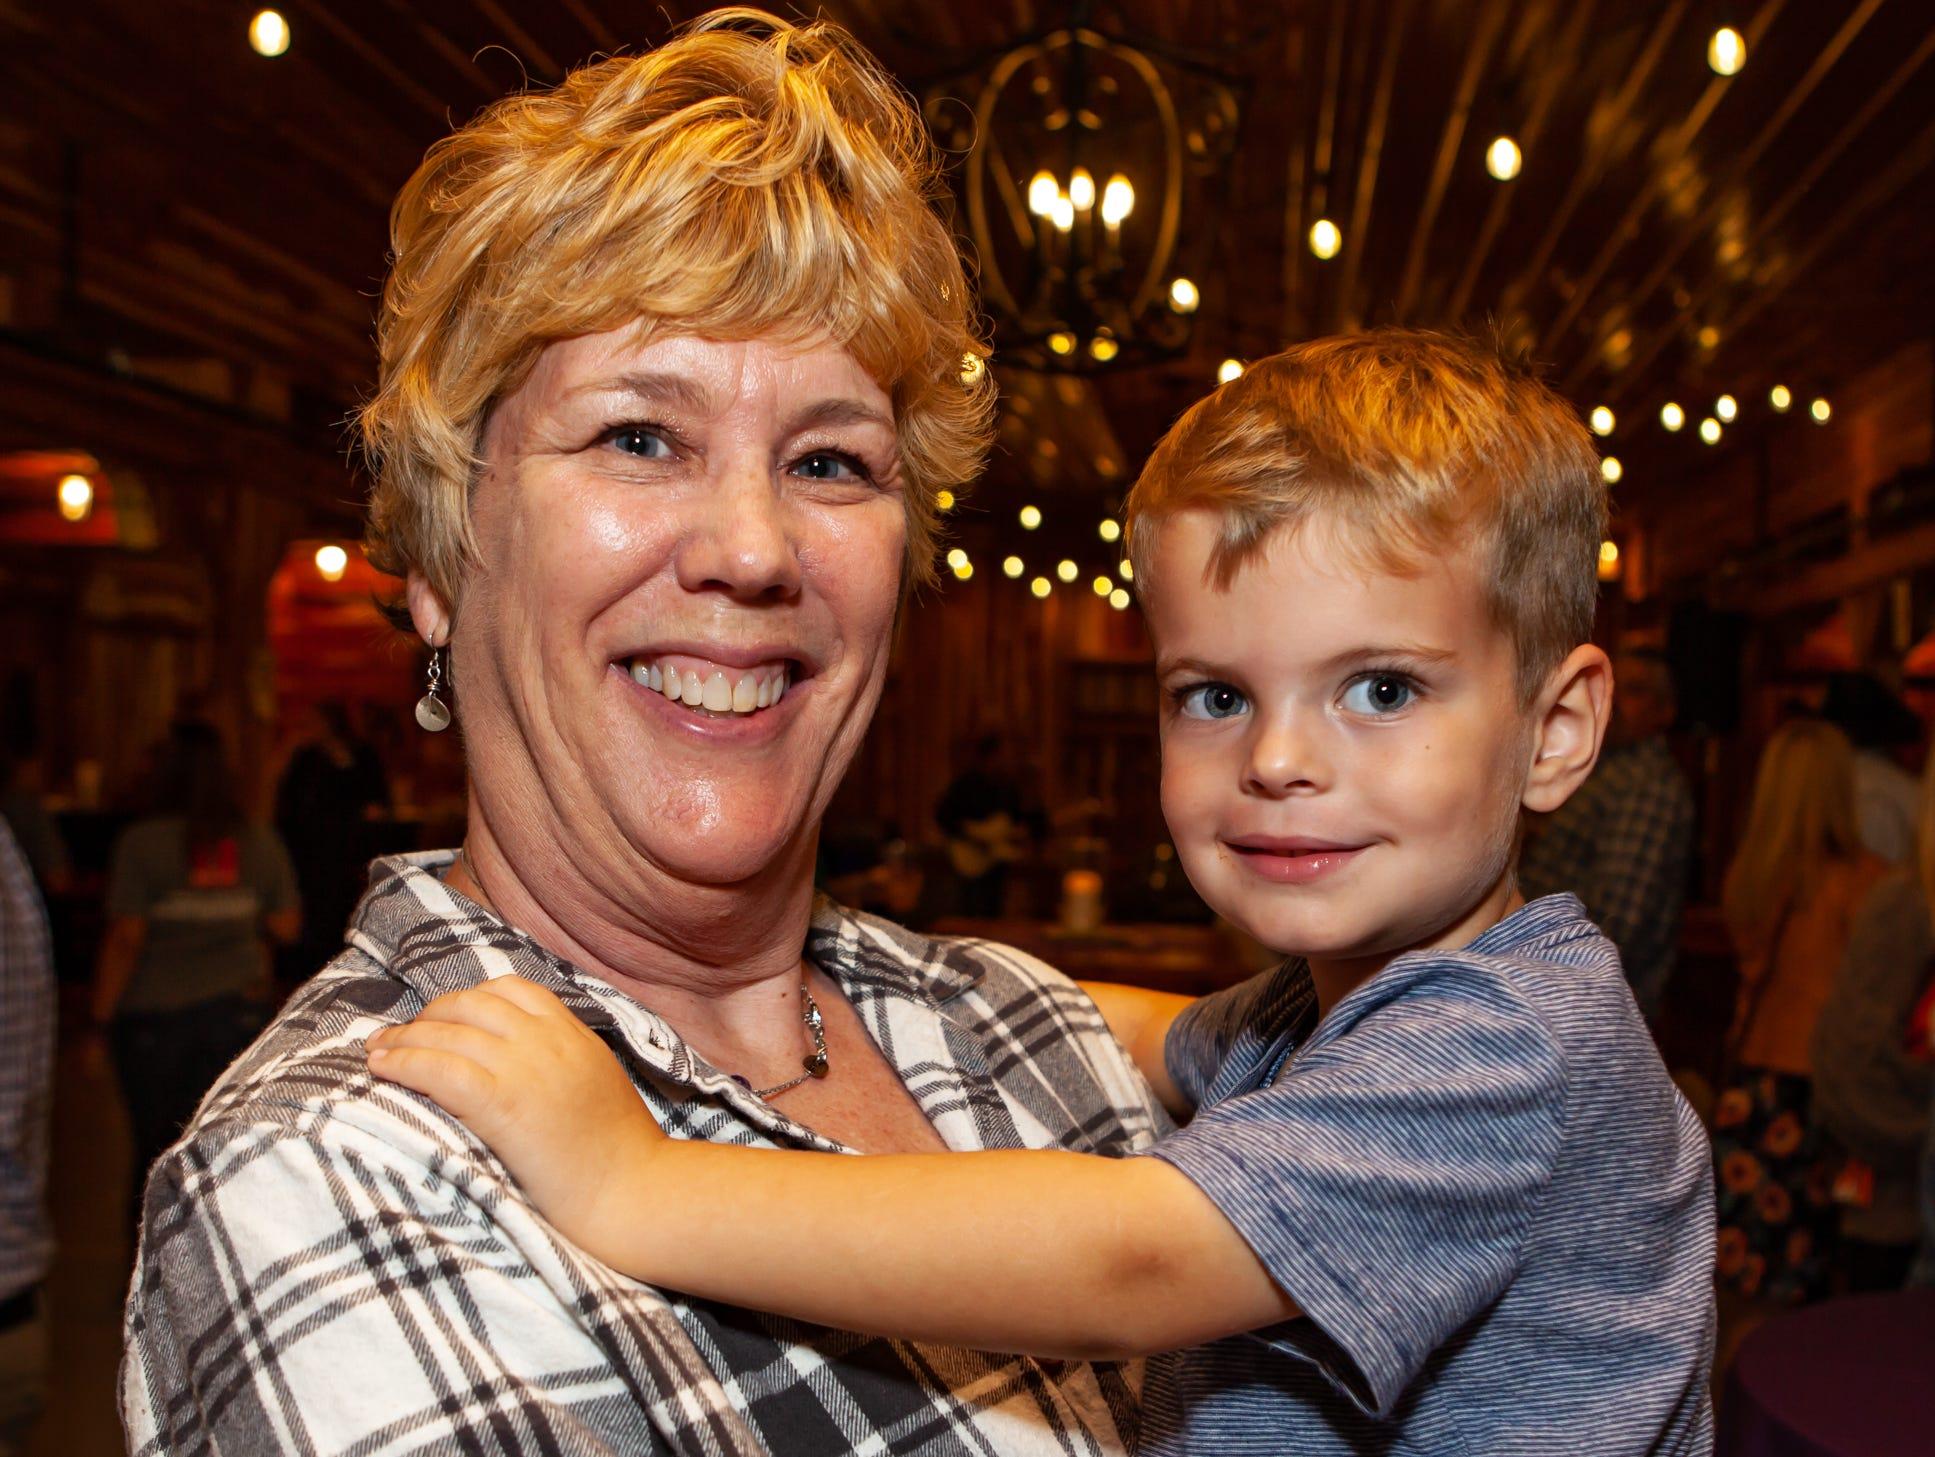 Boot and Brews: Karen Lampert and grandson Dean Brisco